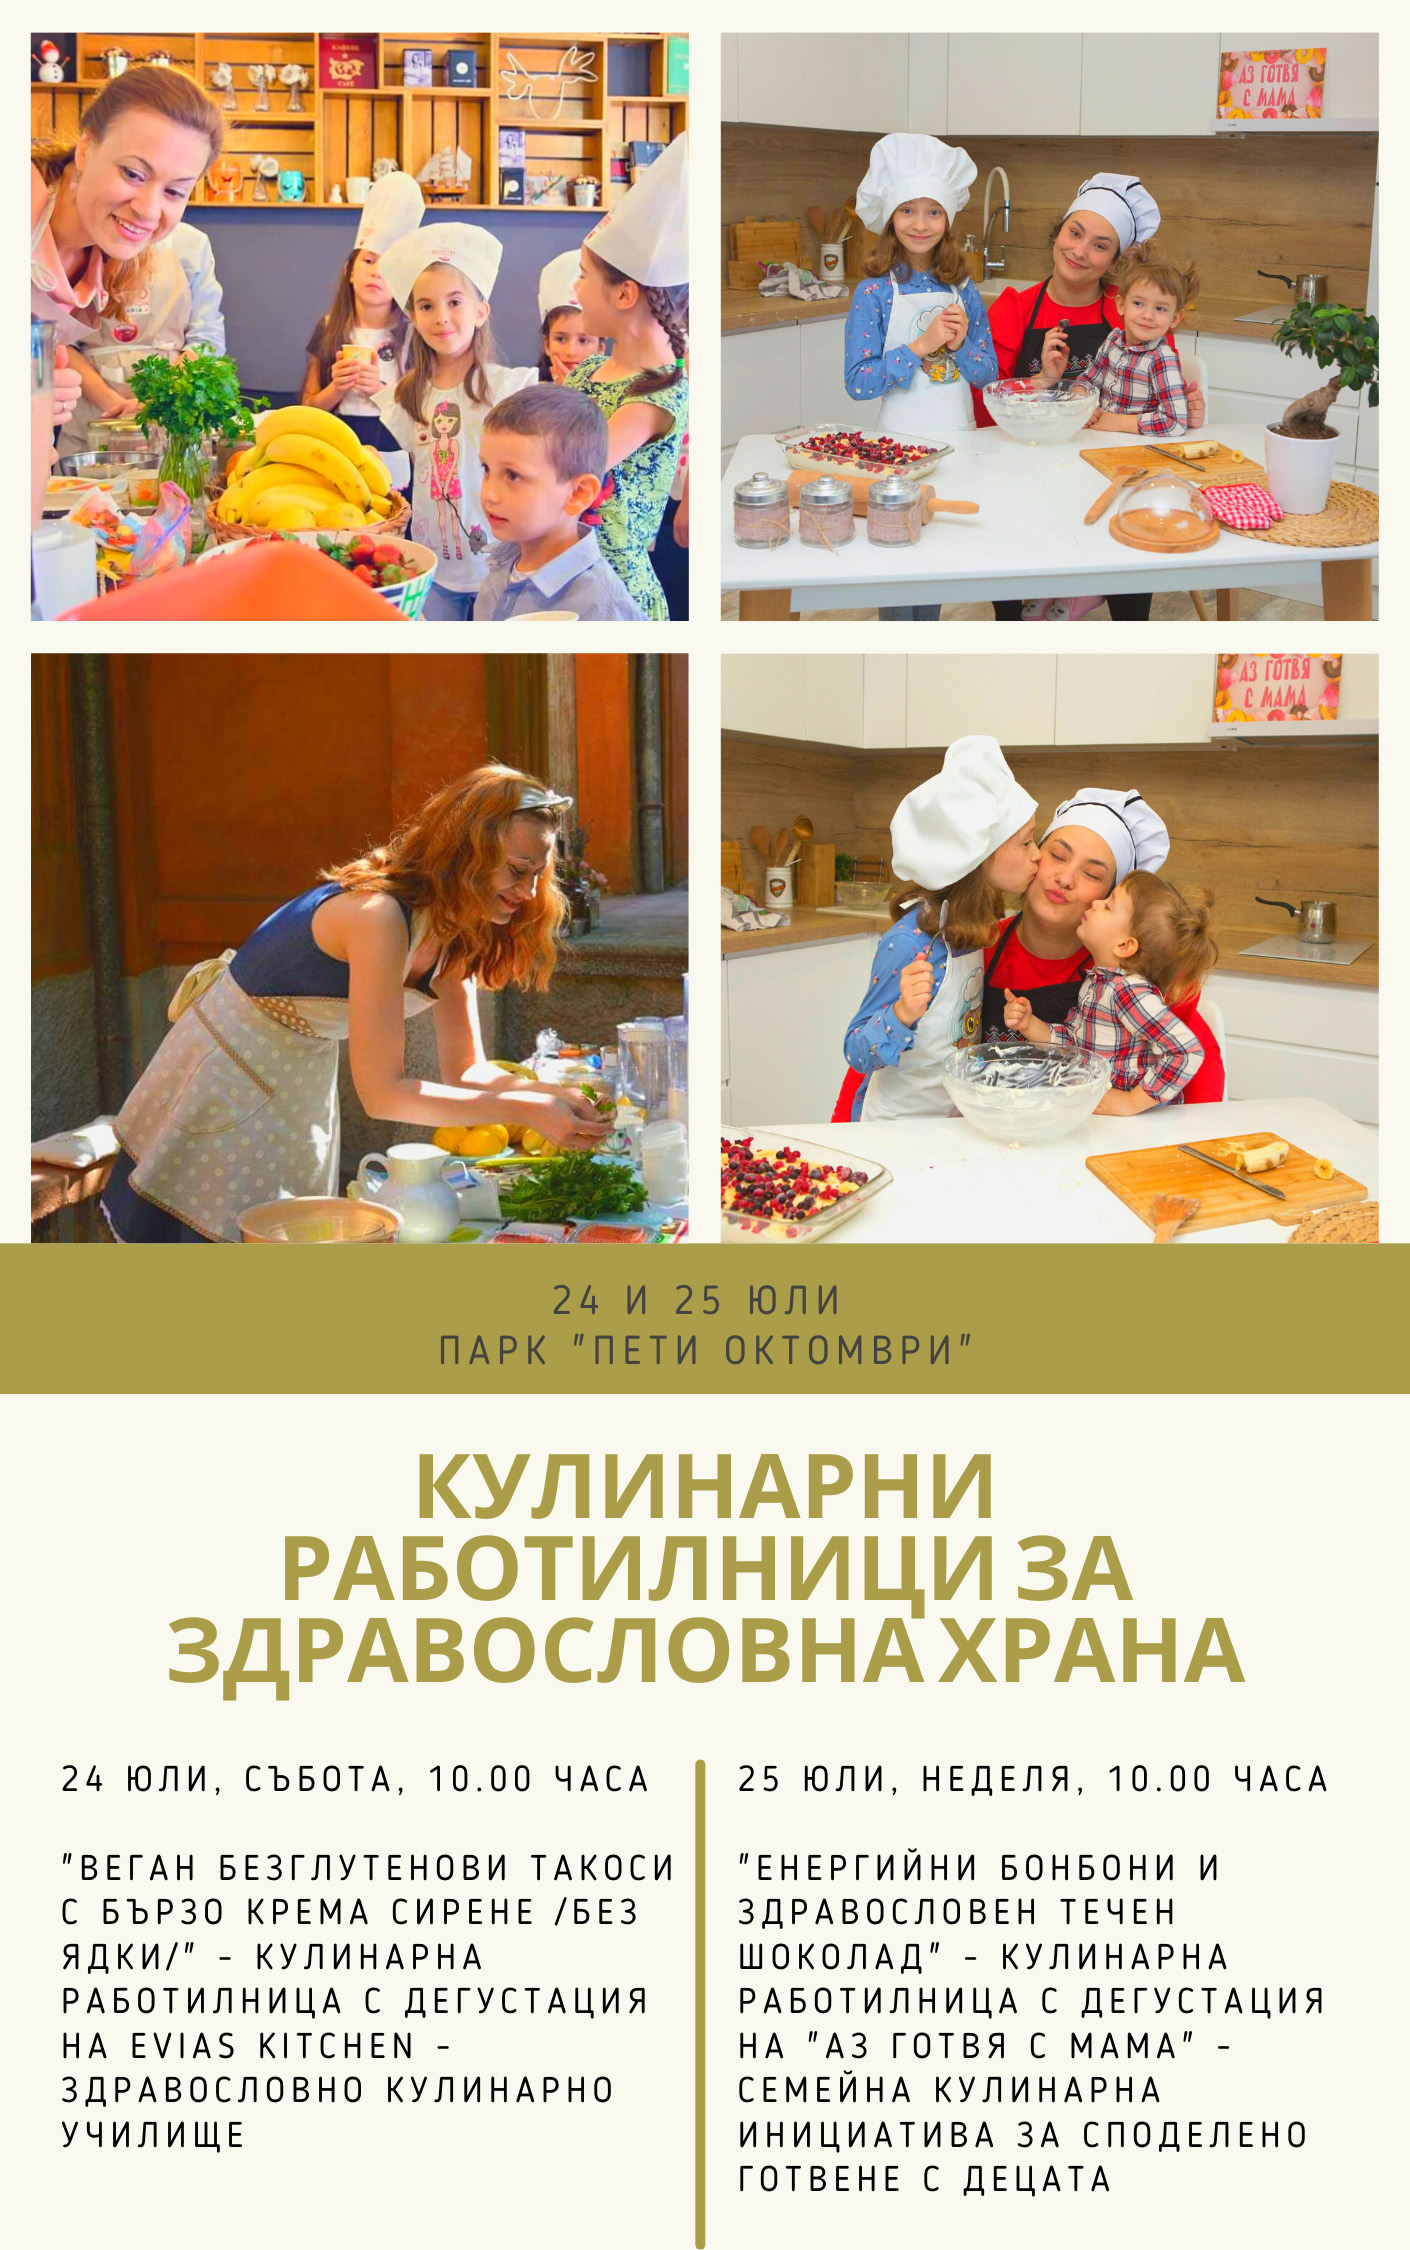 Кулинарни работилници за здравословна храна за малки и големи този уикенд в Стара Загора